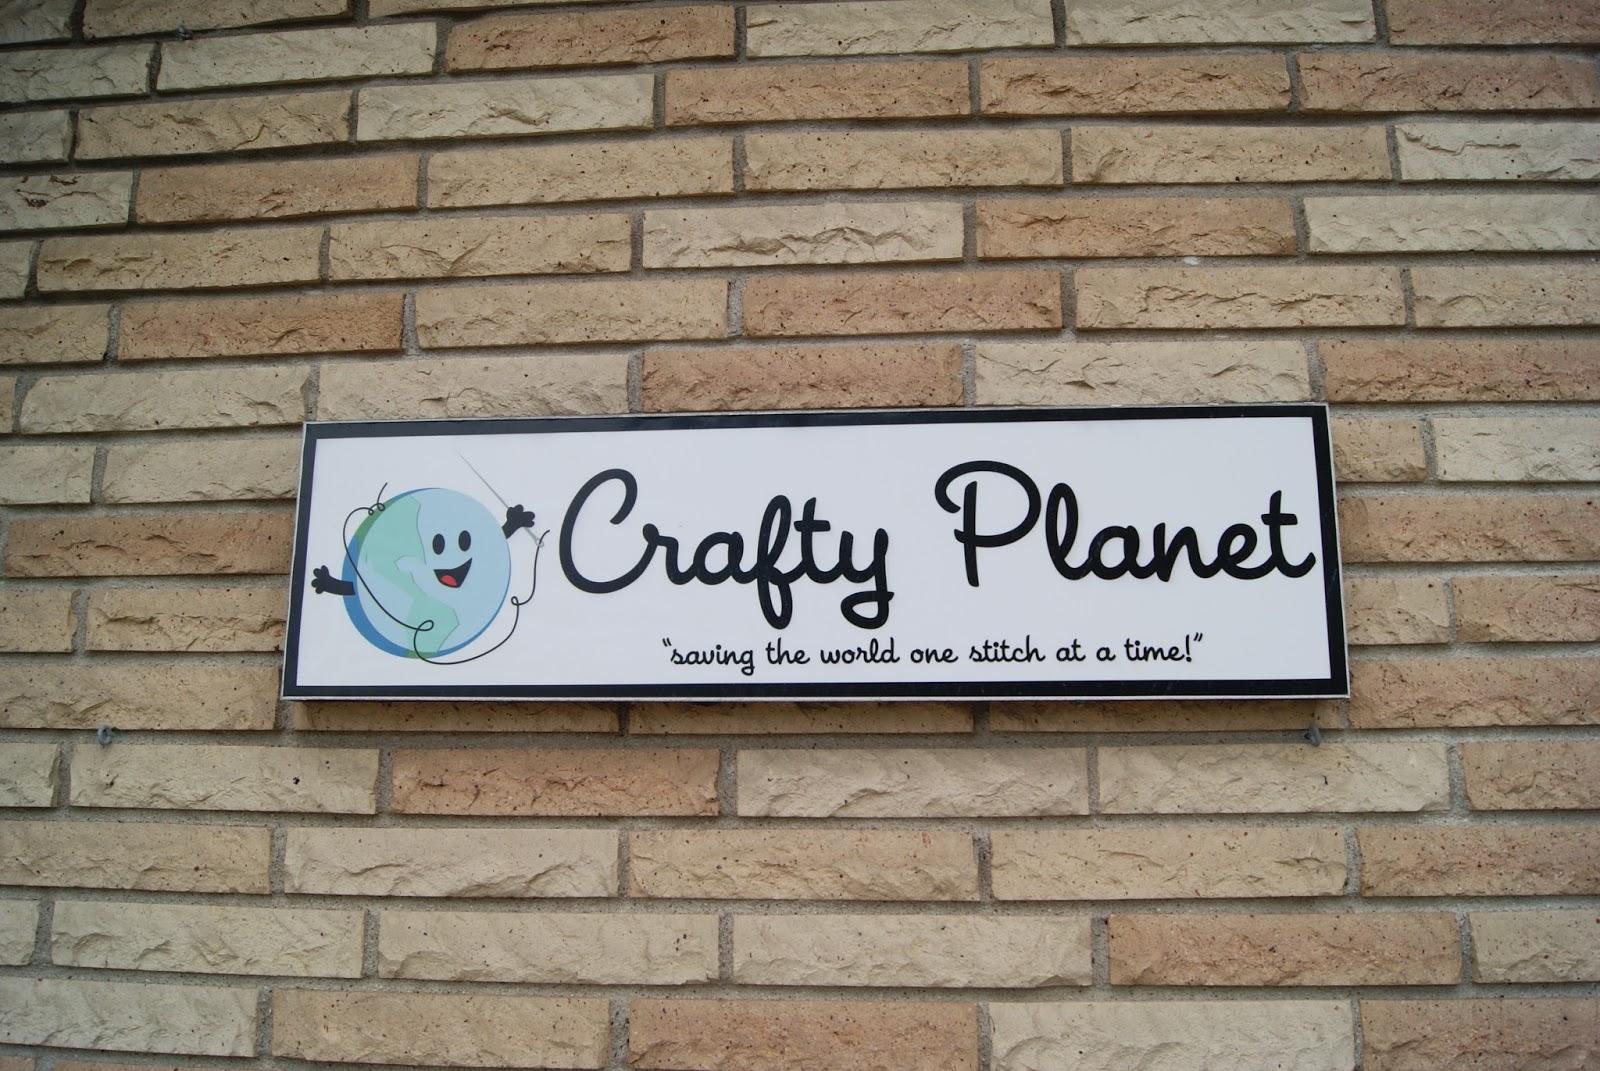 Crafty Planet in Minneapolis, Minnesota